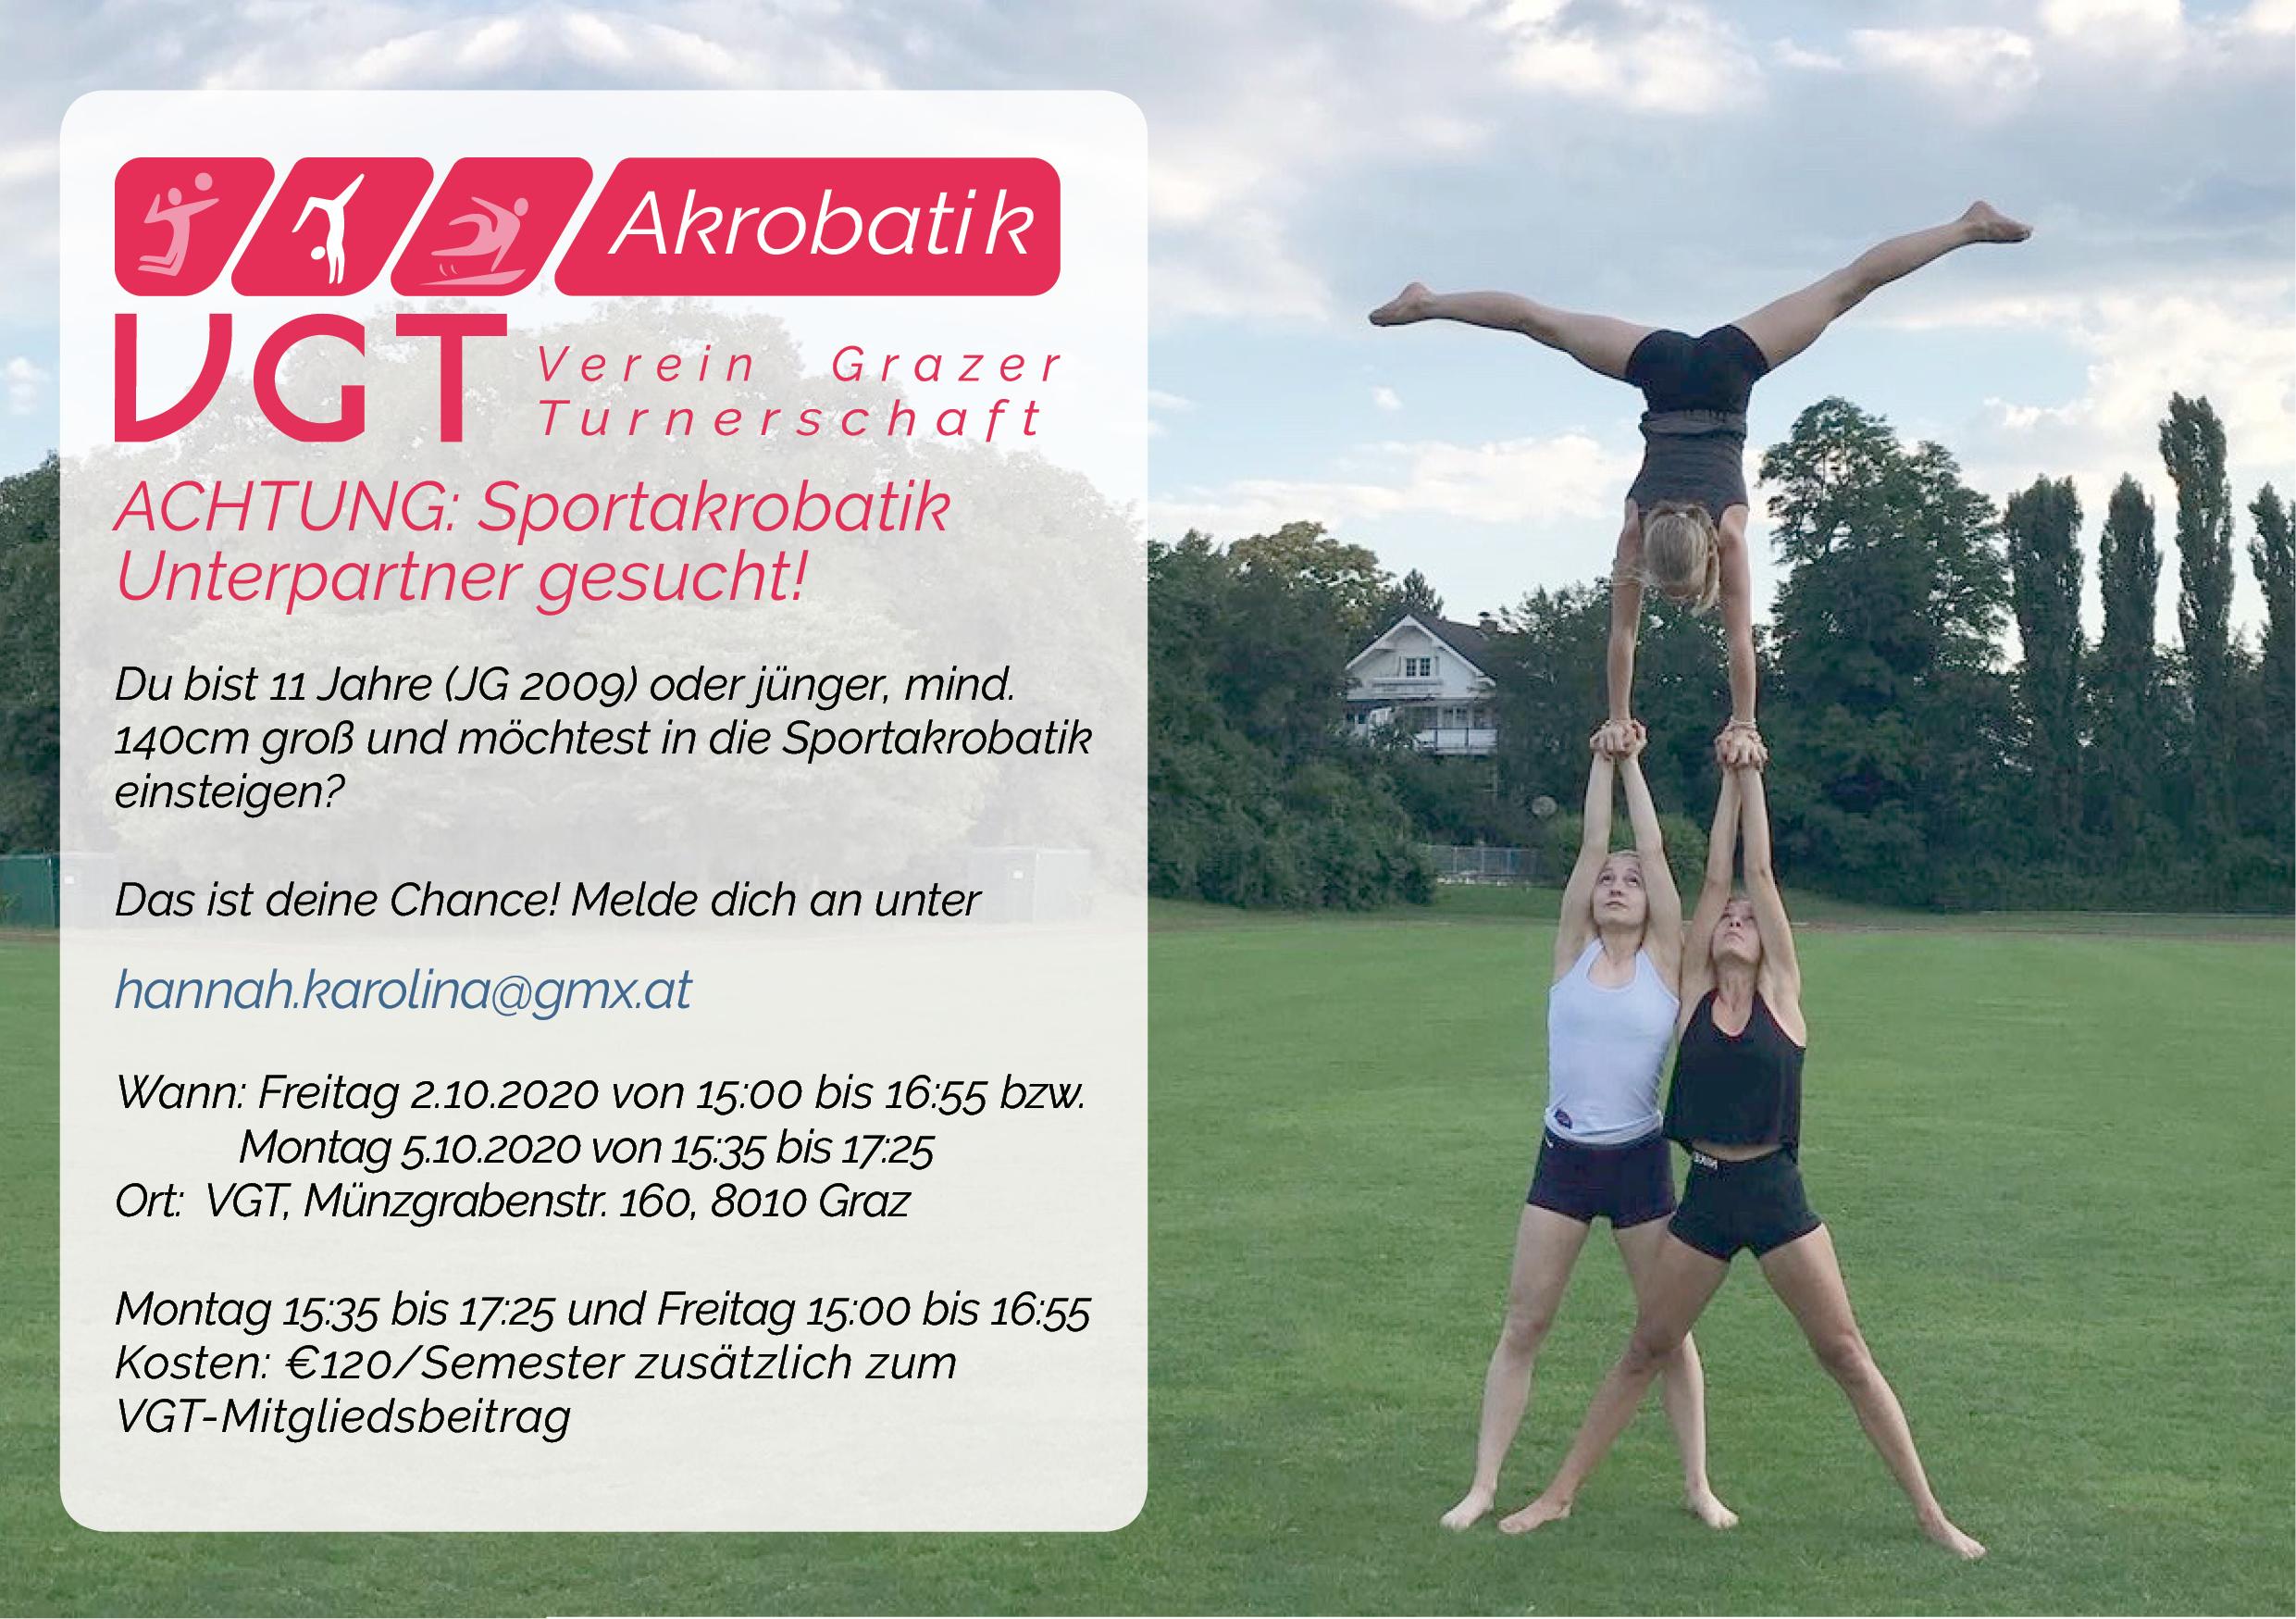 ACHTUNG: Sportakrobatik  Unterpartner gesucht!